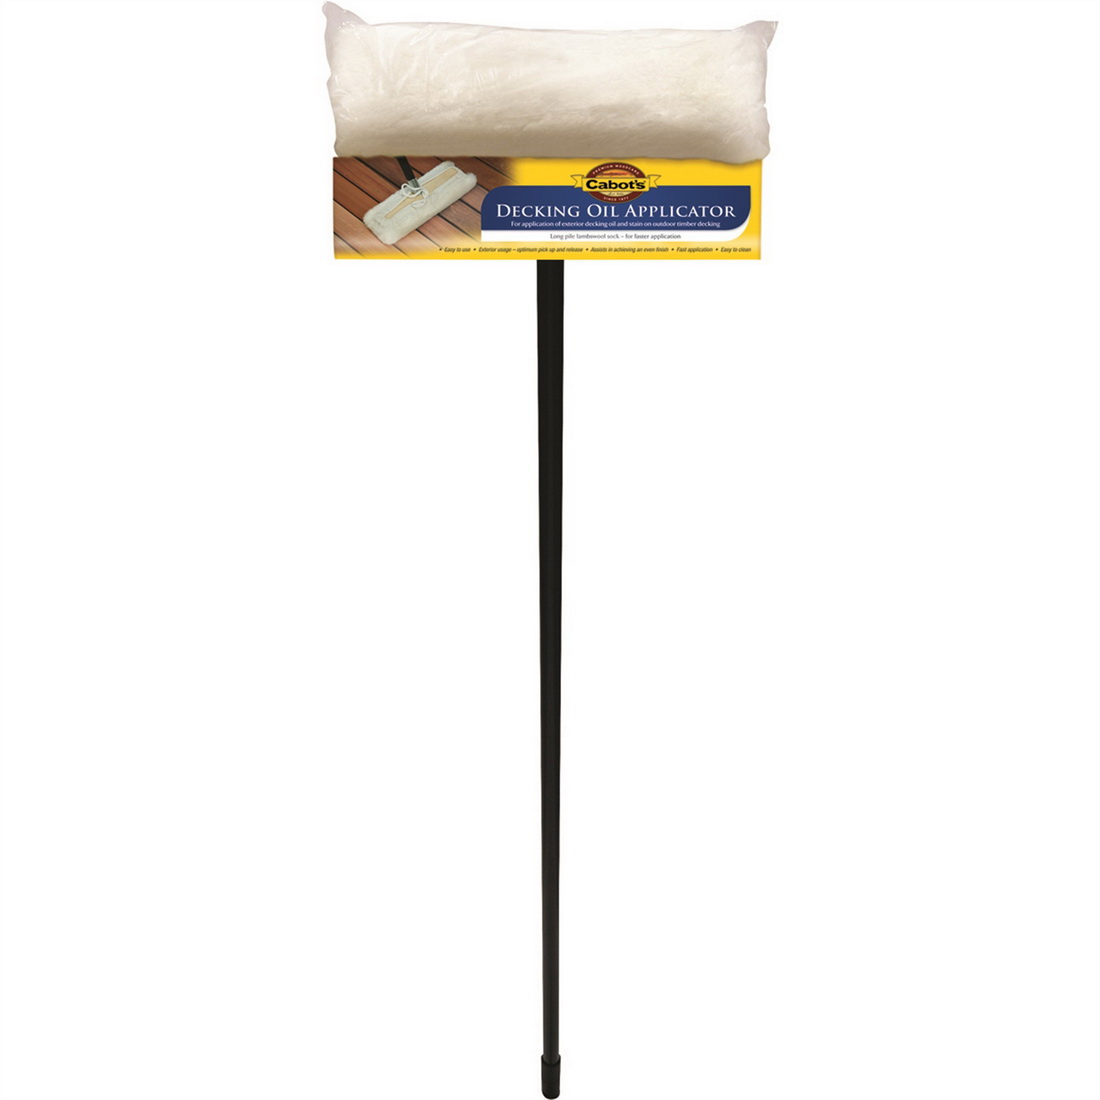 Decking Oil Applicator N2201621-UNIT